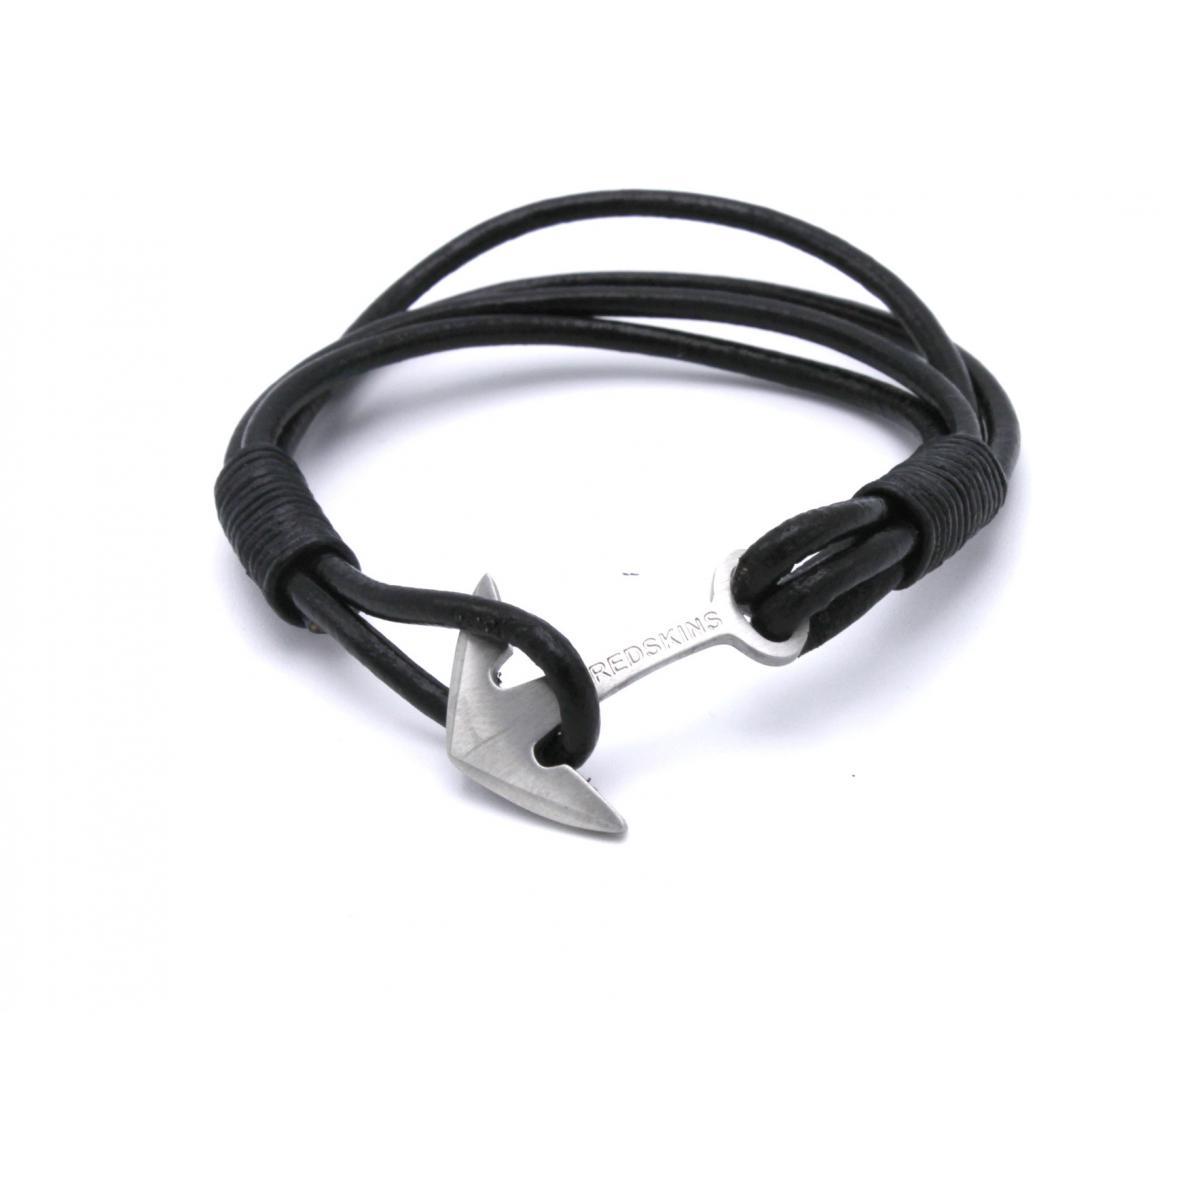 Extremement Bracelet Redskins 285120 - Bracelet Ancre Cuir Noir Homme sur VK-88